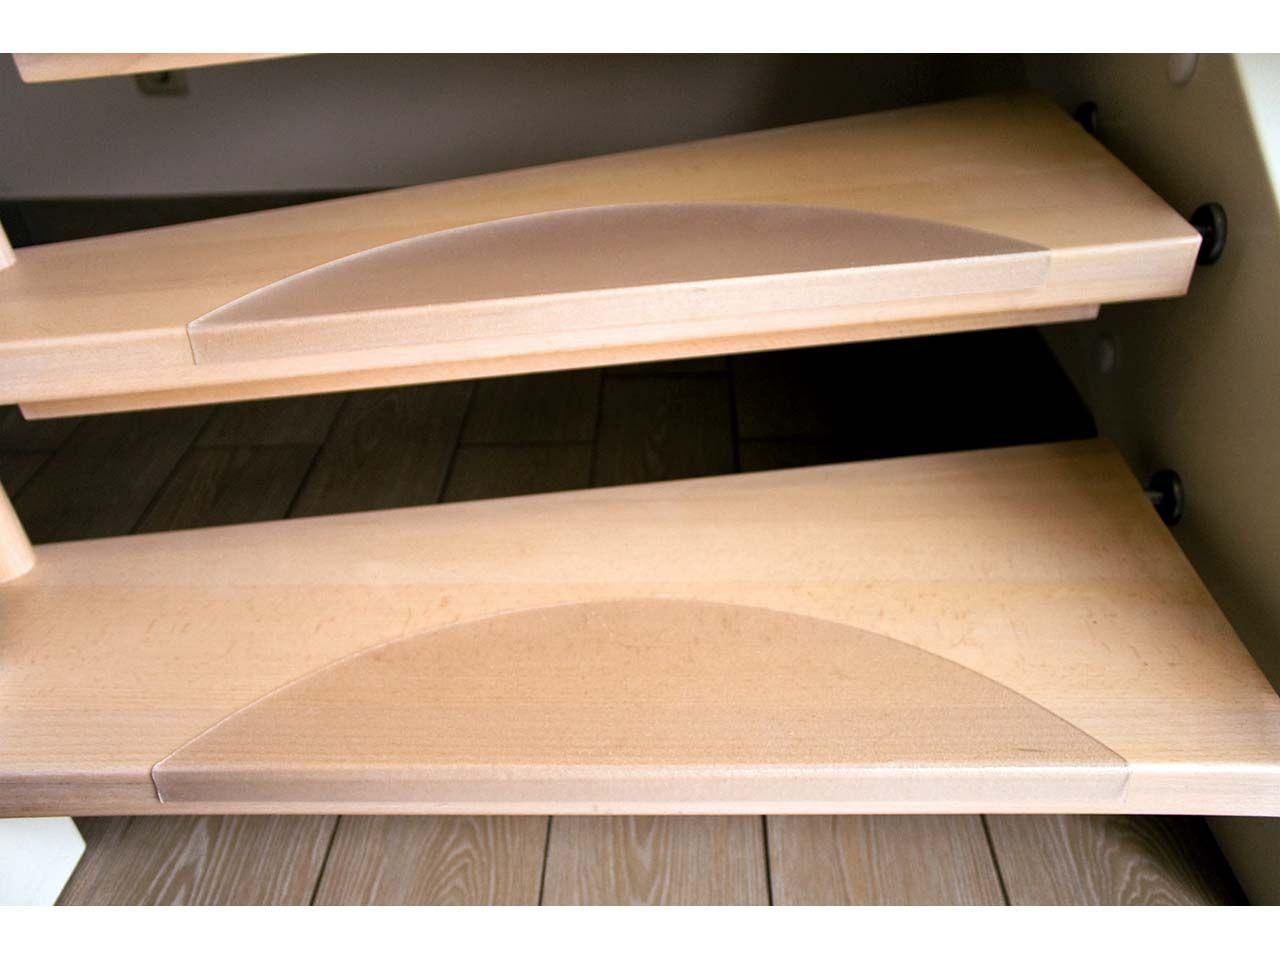 Treppenstufenmatte Halbkreis Trittfläche 56 x 14,5 cm Treppe -5617